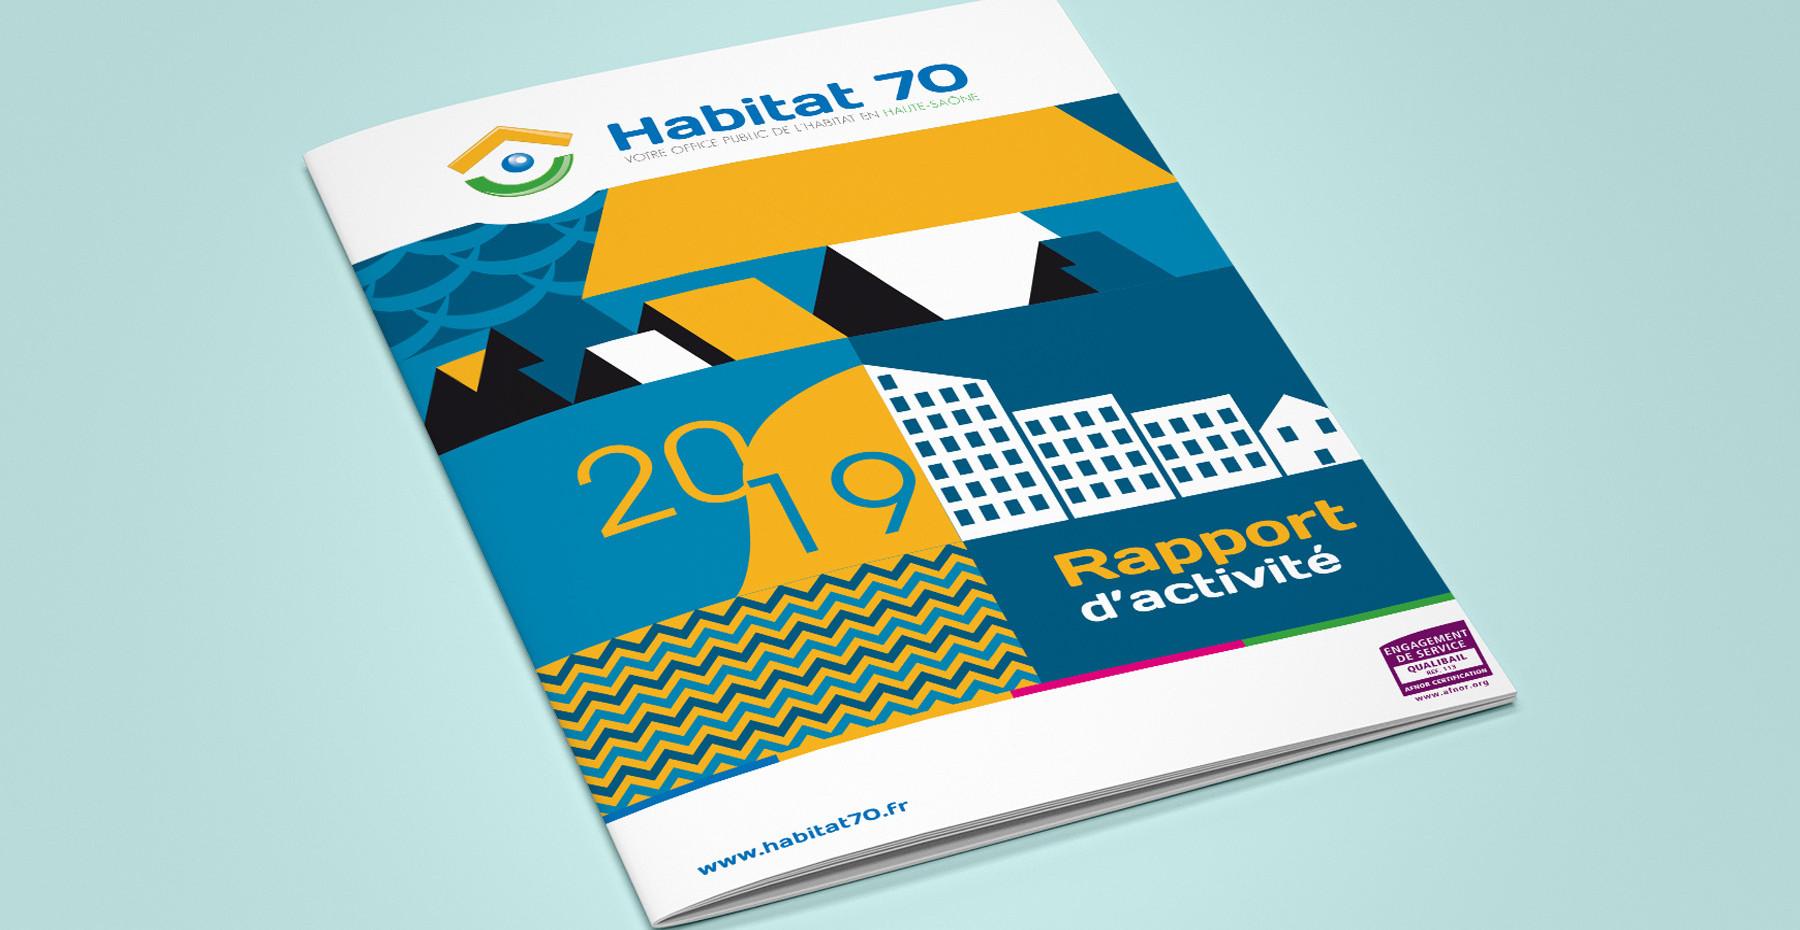 Habitat 70-Rapport activite.jpg